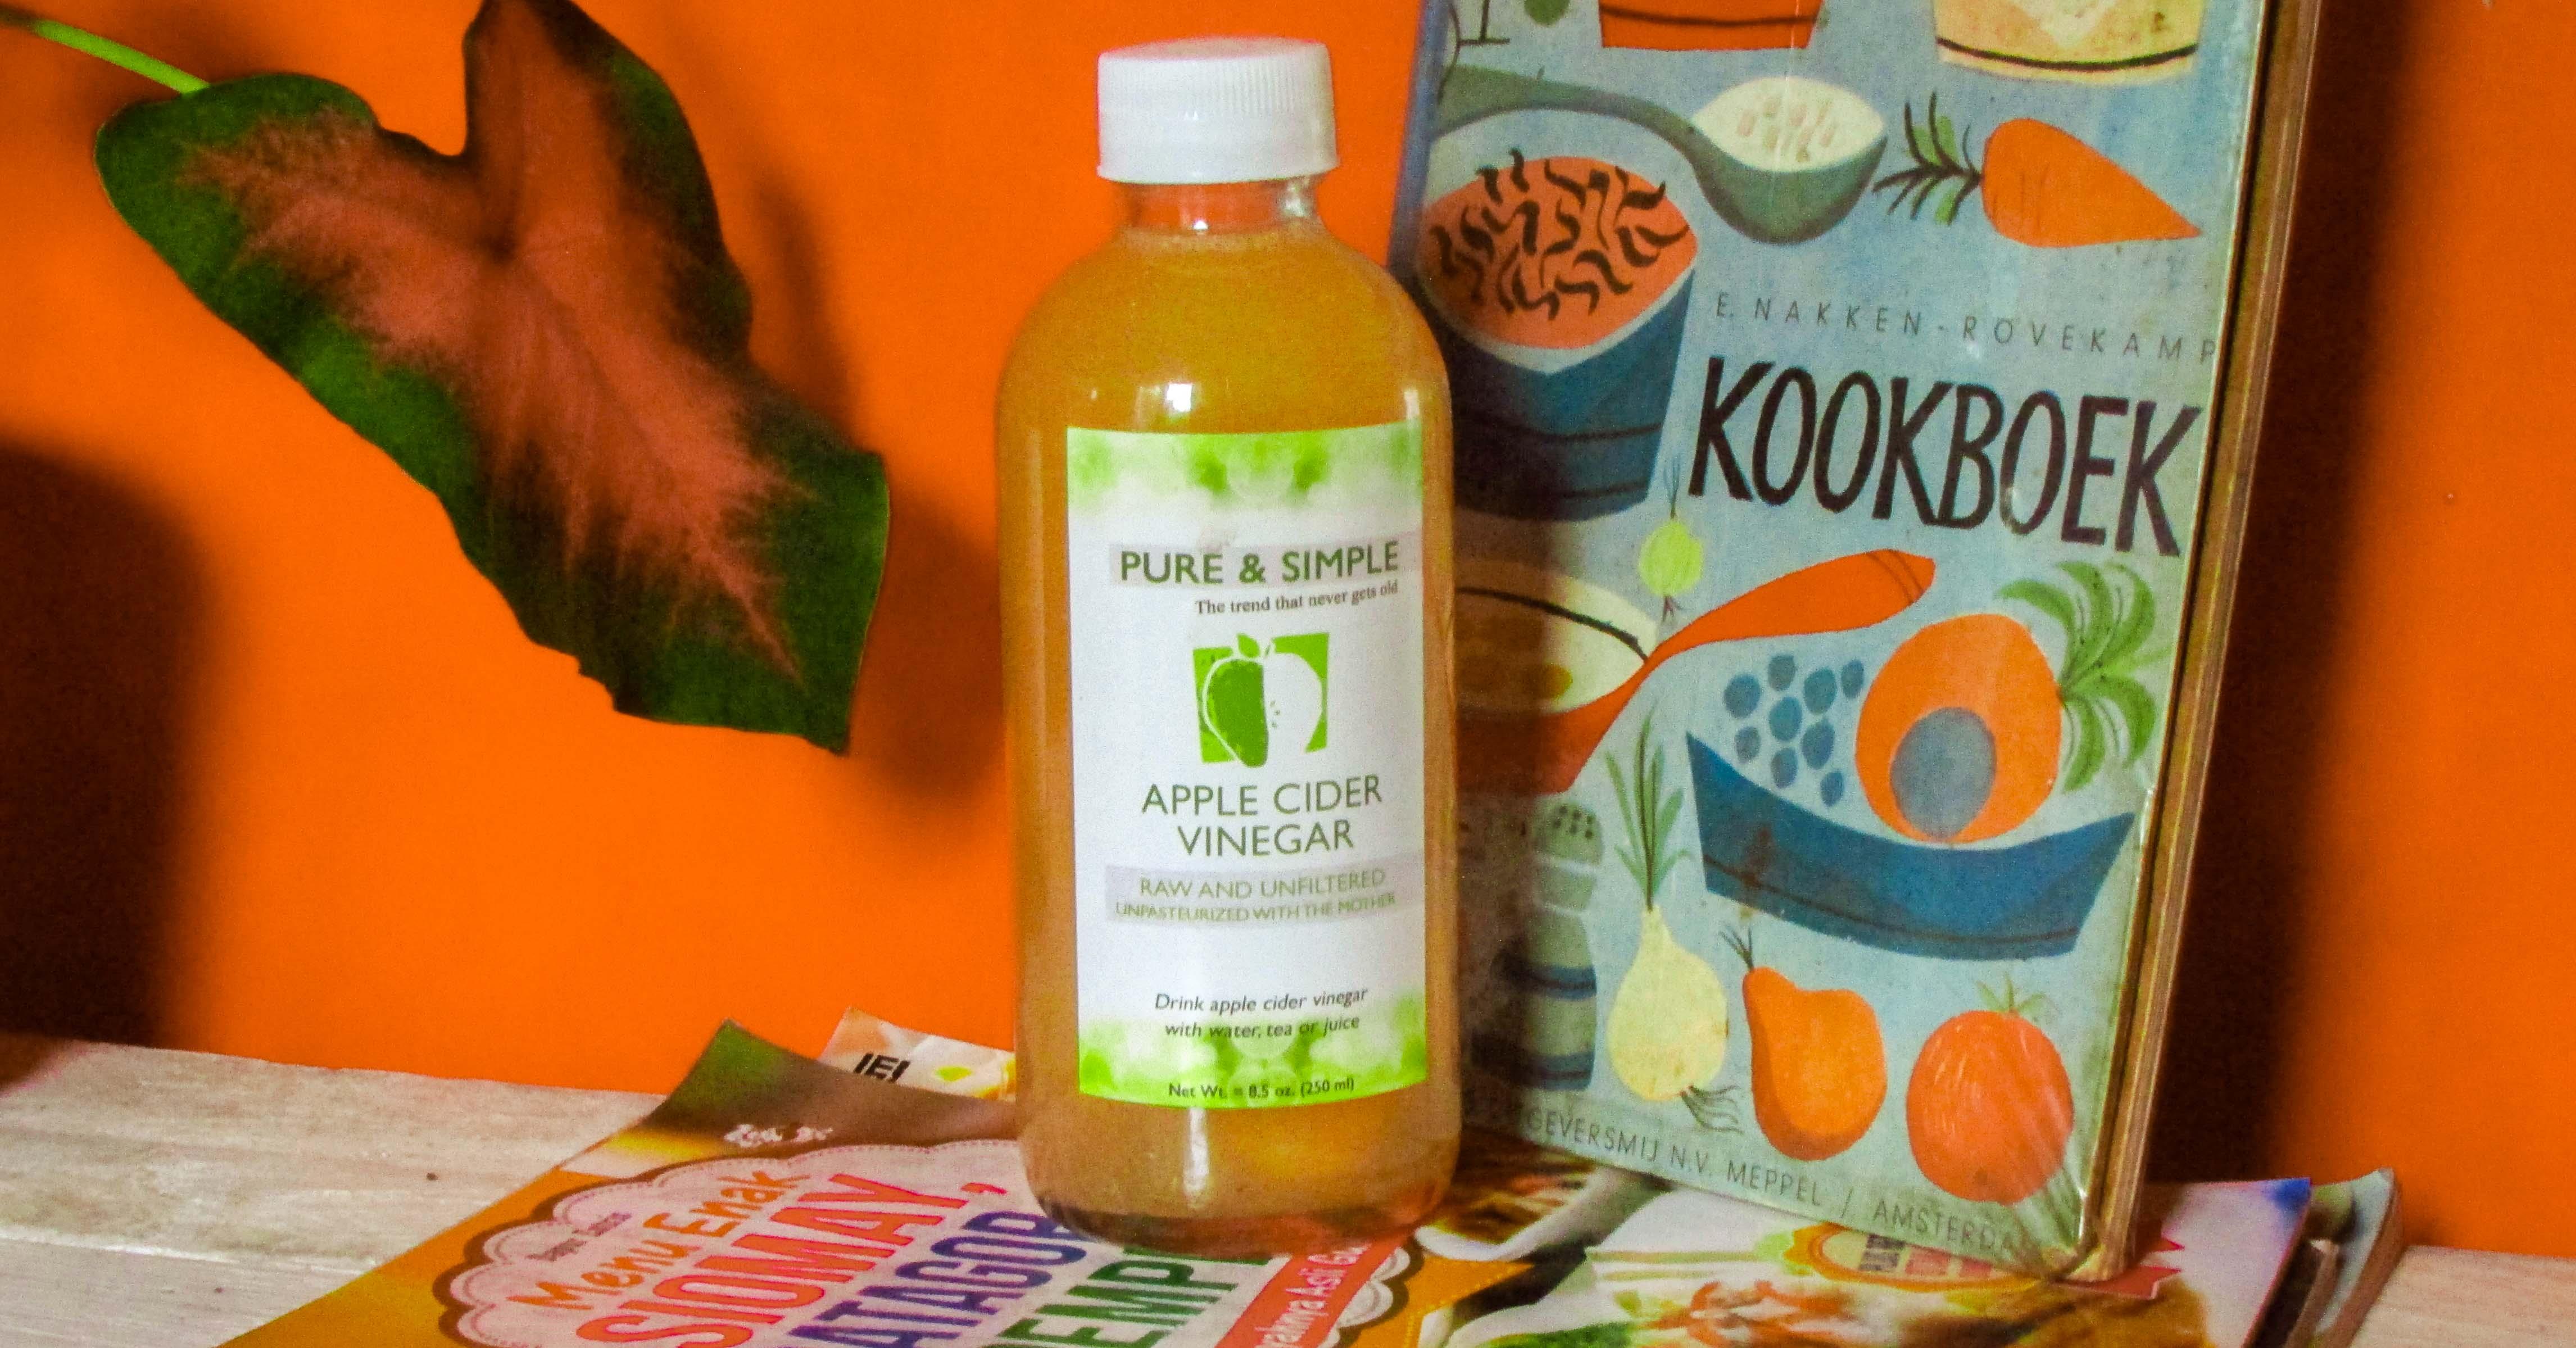 Pure and Simple Apple Cider Vinegar